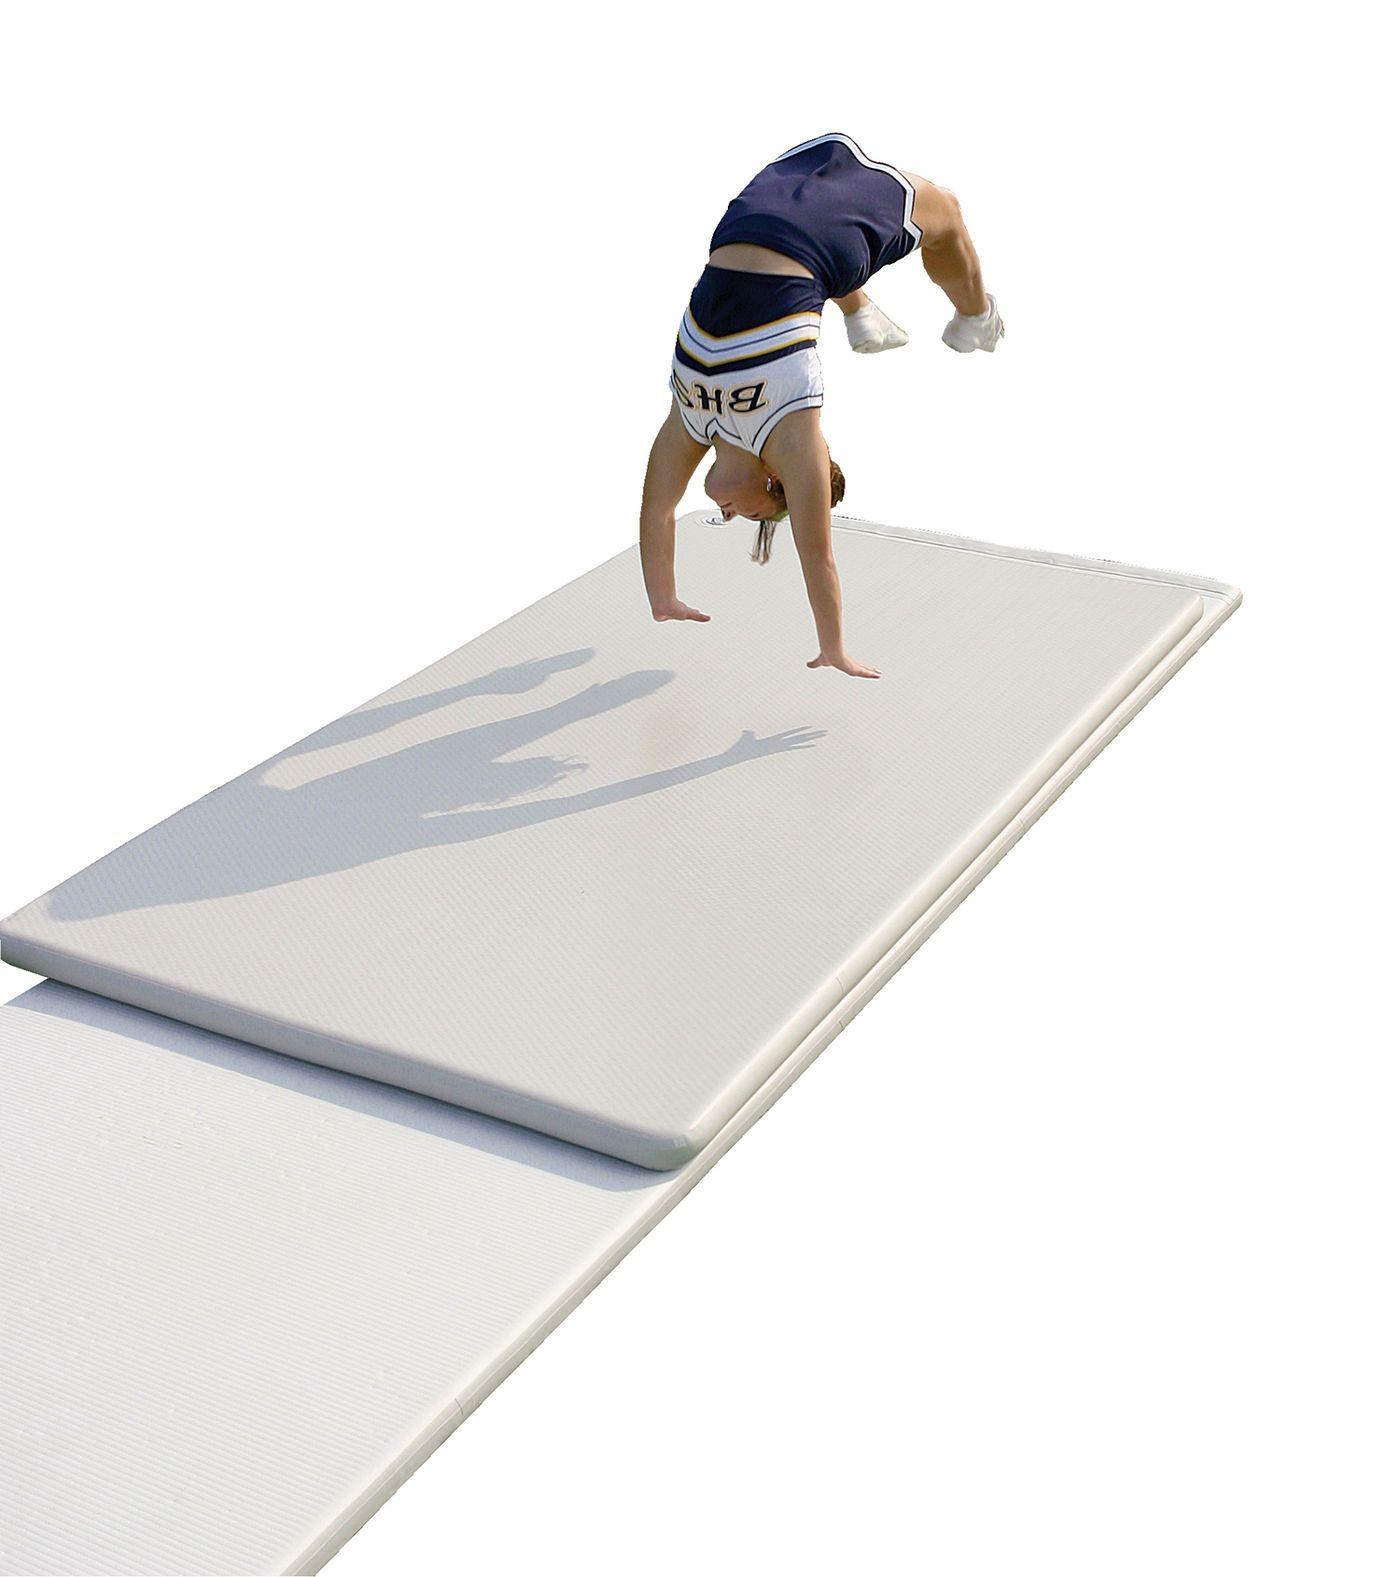 health flooring tri used n sunny mats gym fold sports gymnastics mat in exercise fitness canada en rec walmart